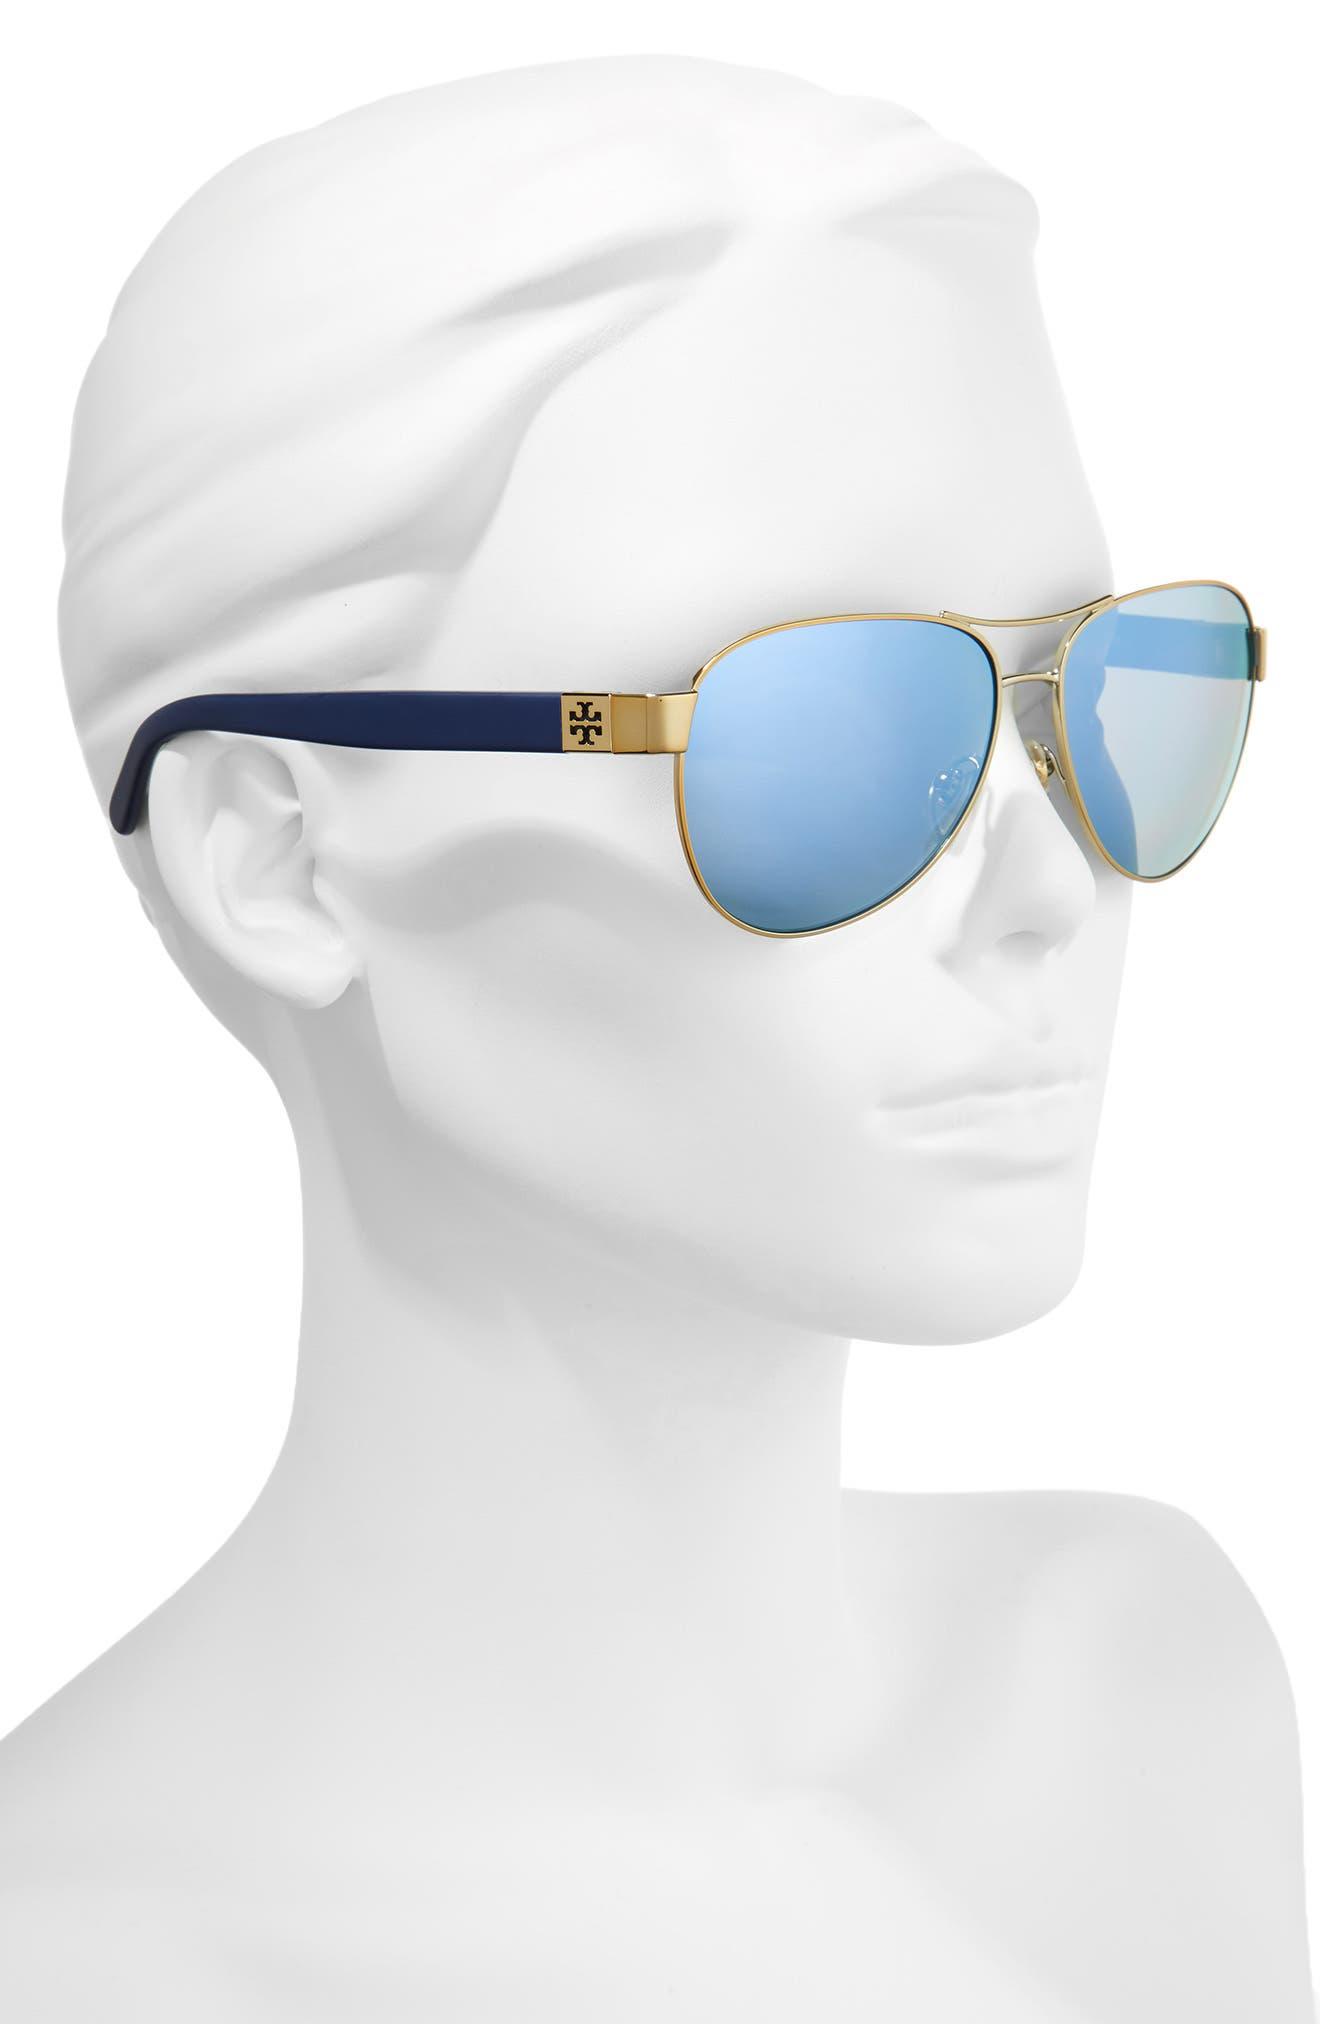 60mm Polarized Aviator Sunglasses,                             Alternate thumbnail 2, color,                             Gold